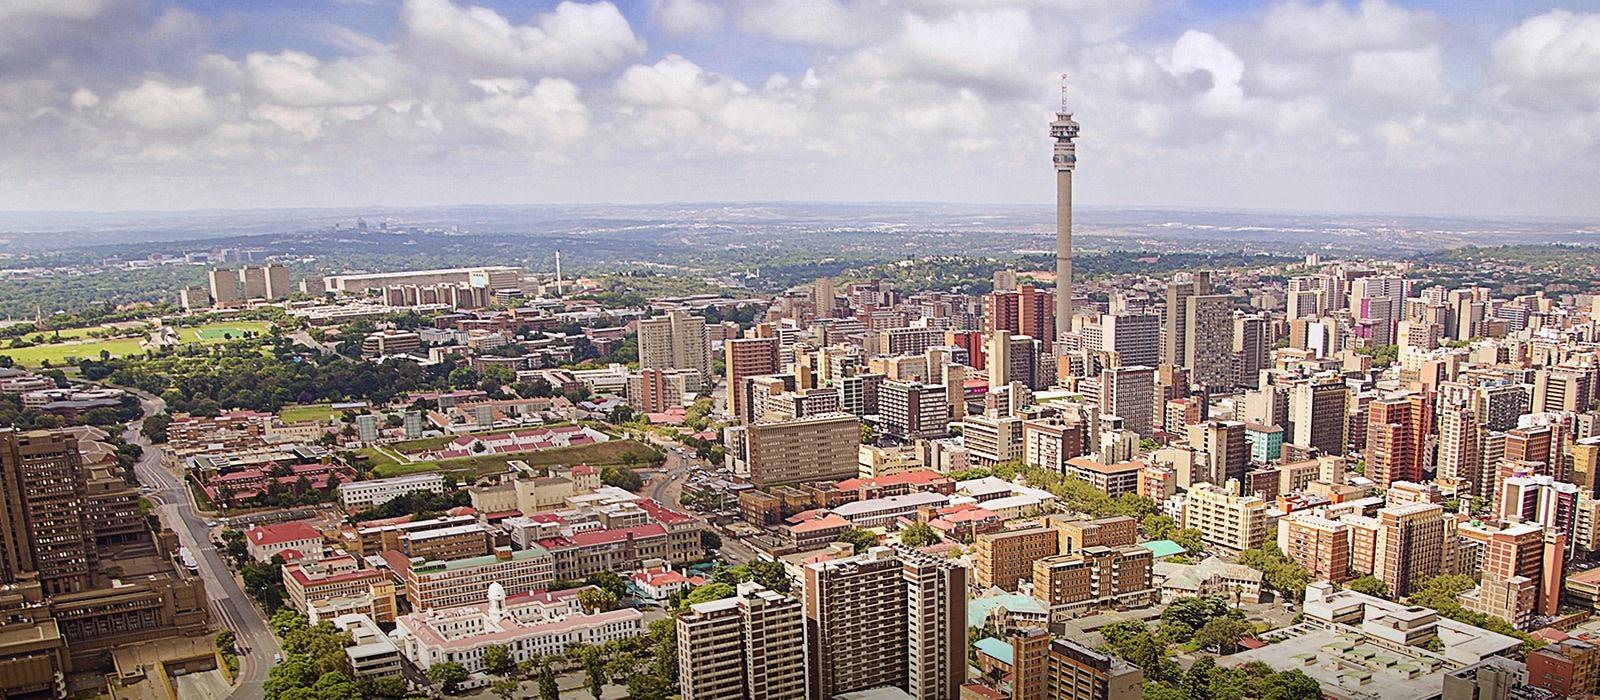 south africa johannesburg 1